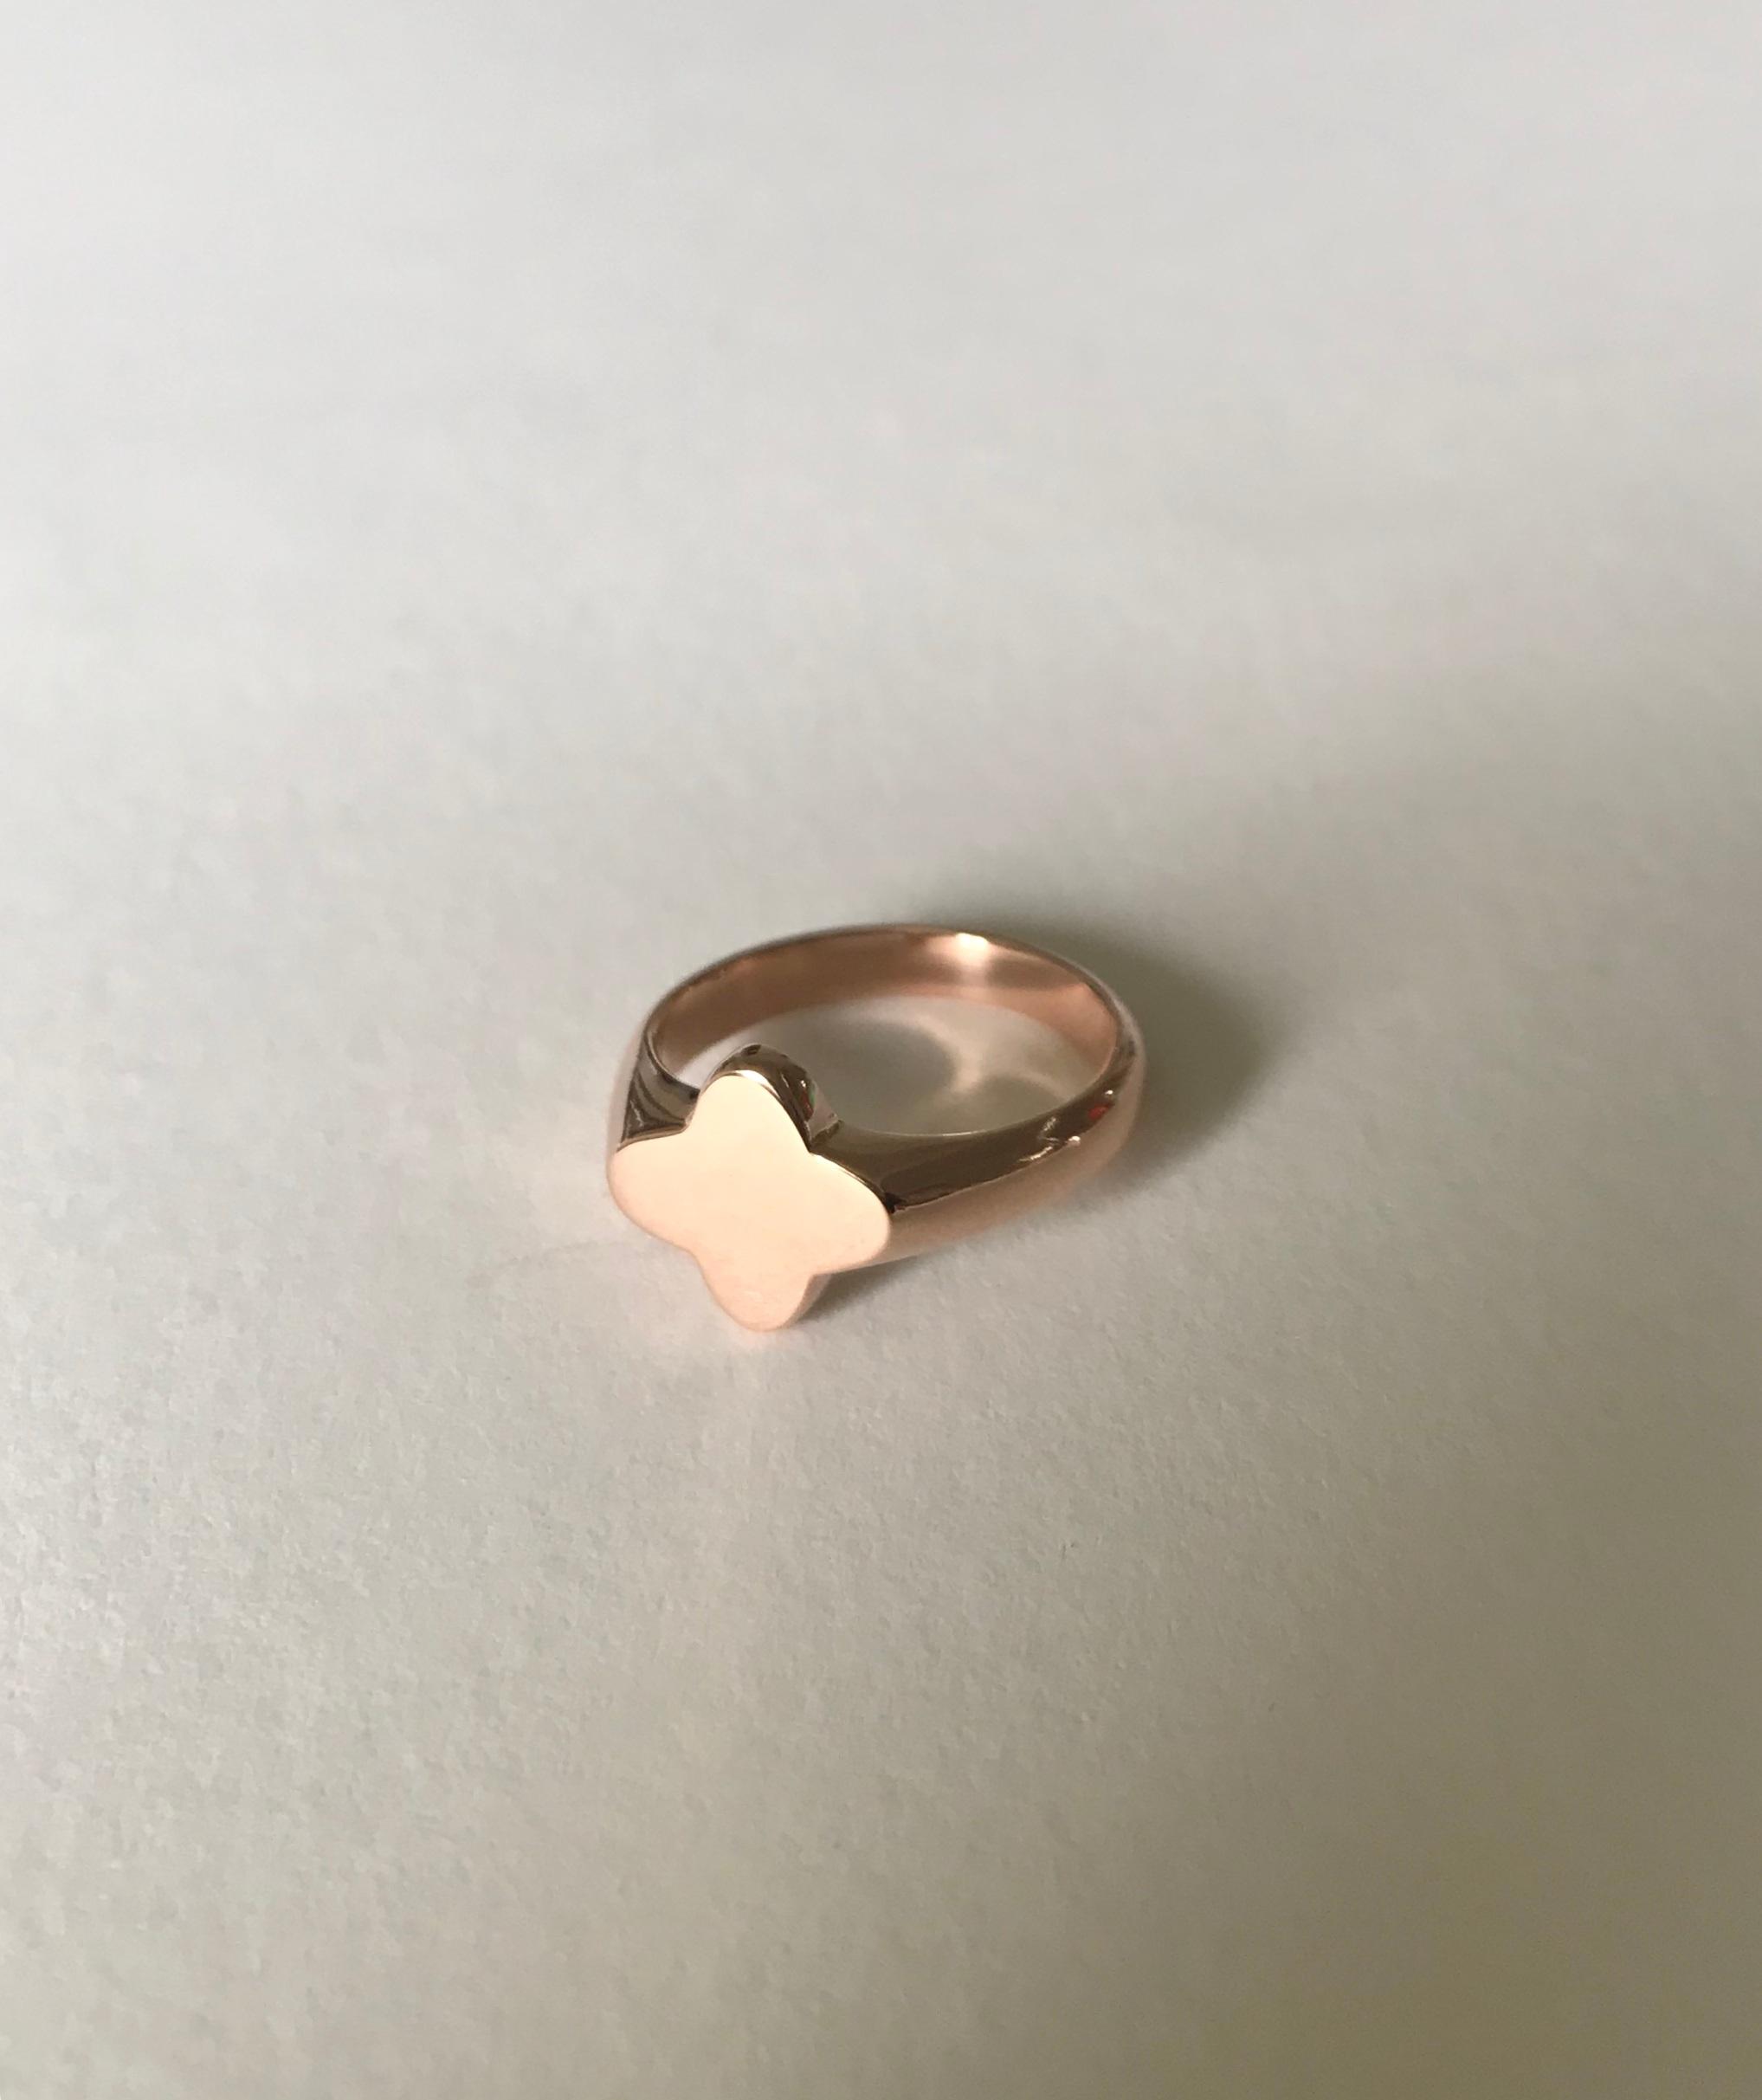 ANNE Clover Pinkie Signet Ring:  hand-carved,   14k rose gold.